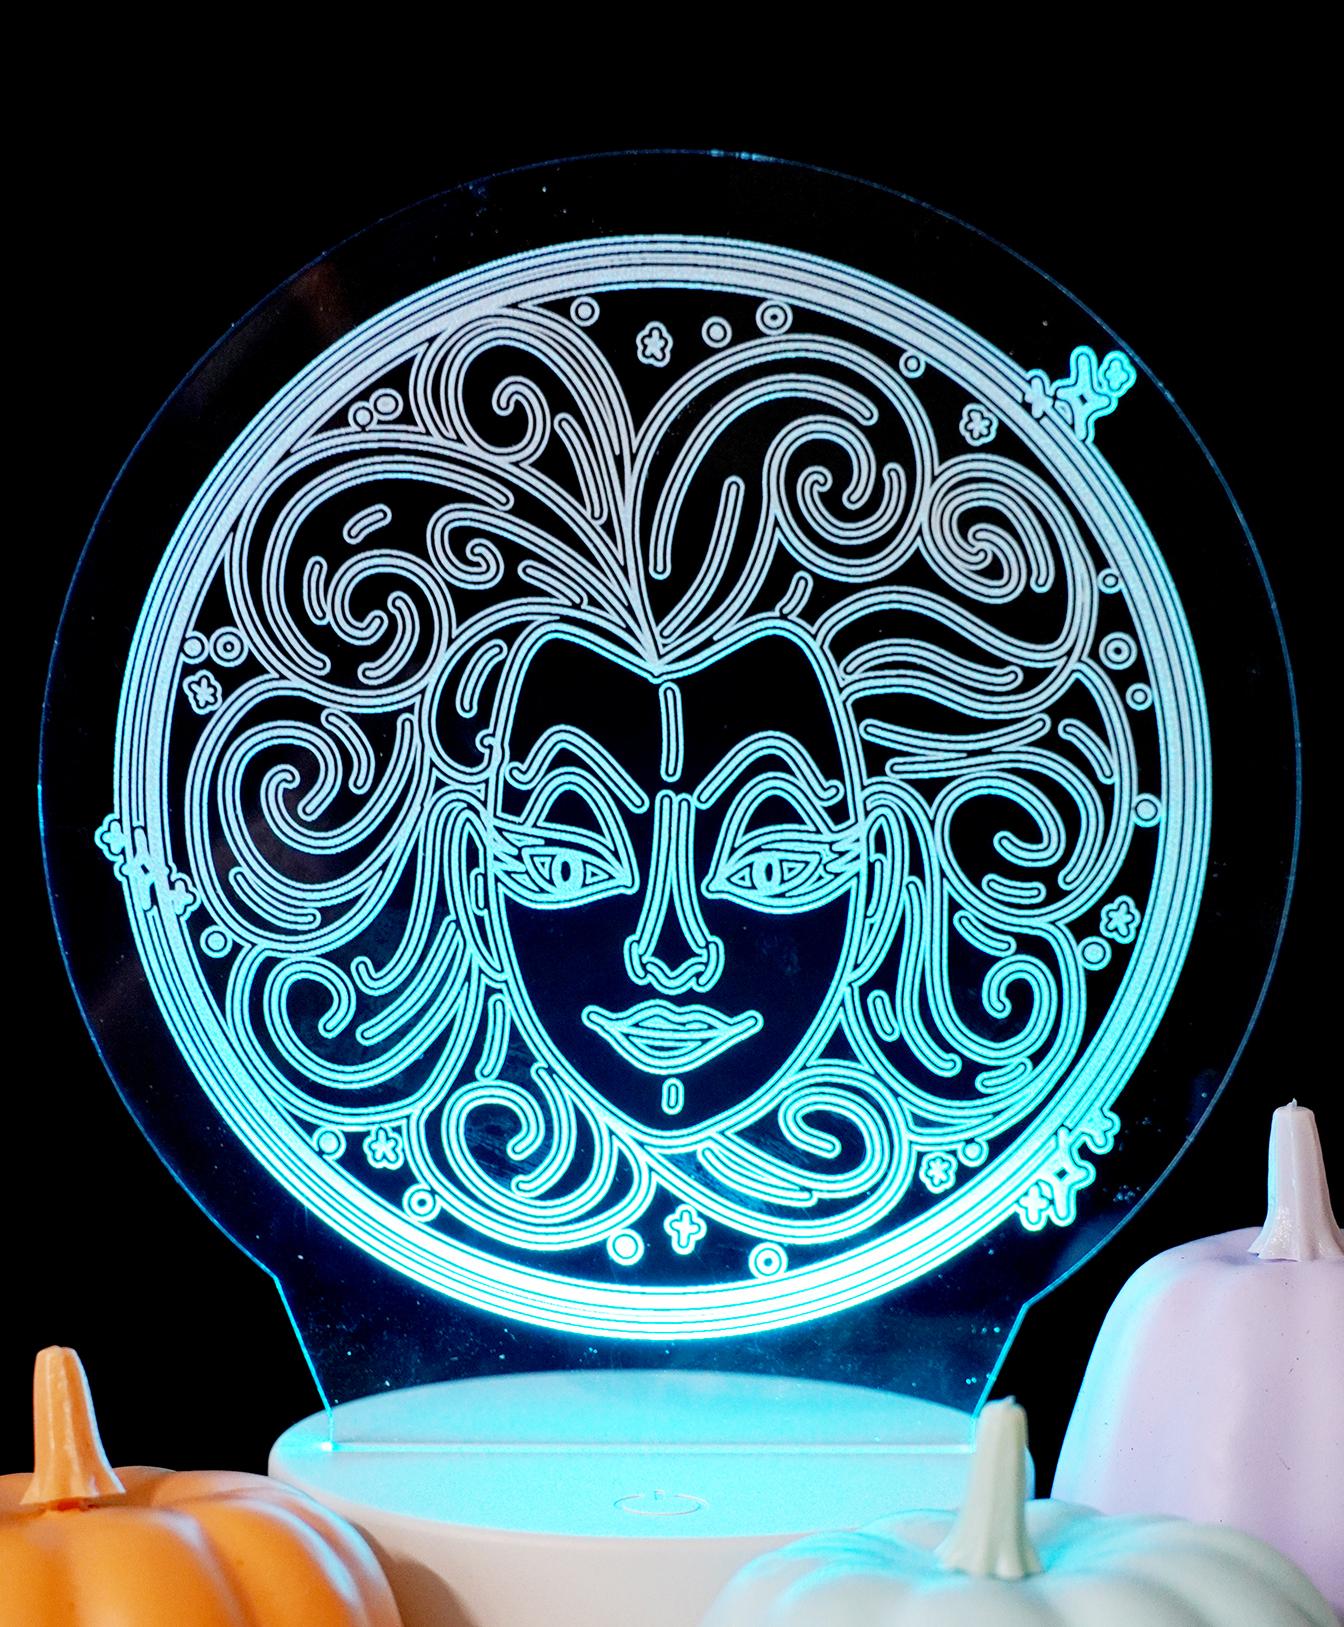 Glowing Acrylic Nightlight with Madame leota Free SVG File